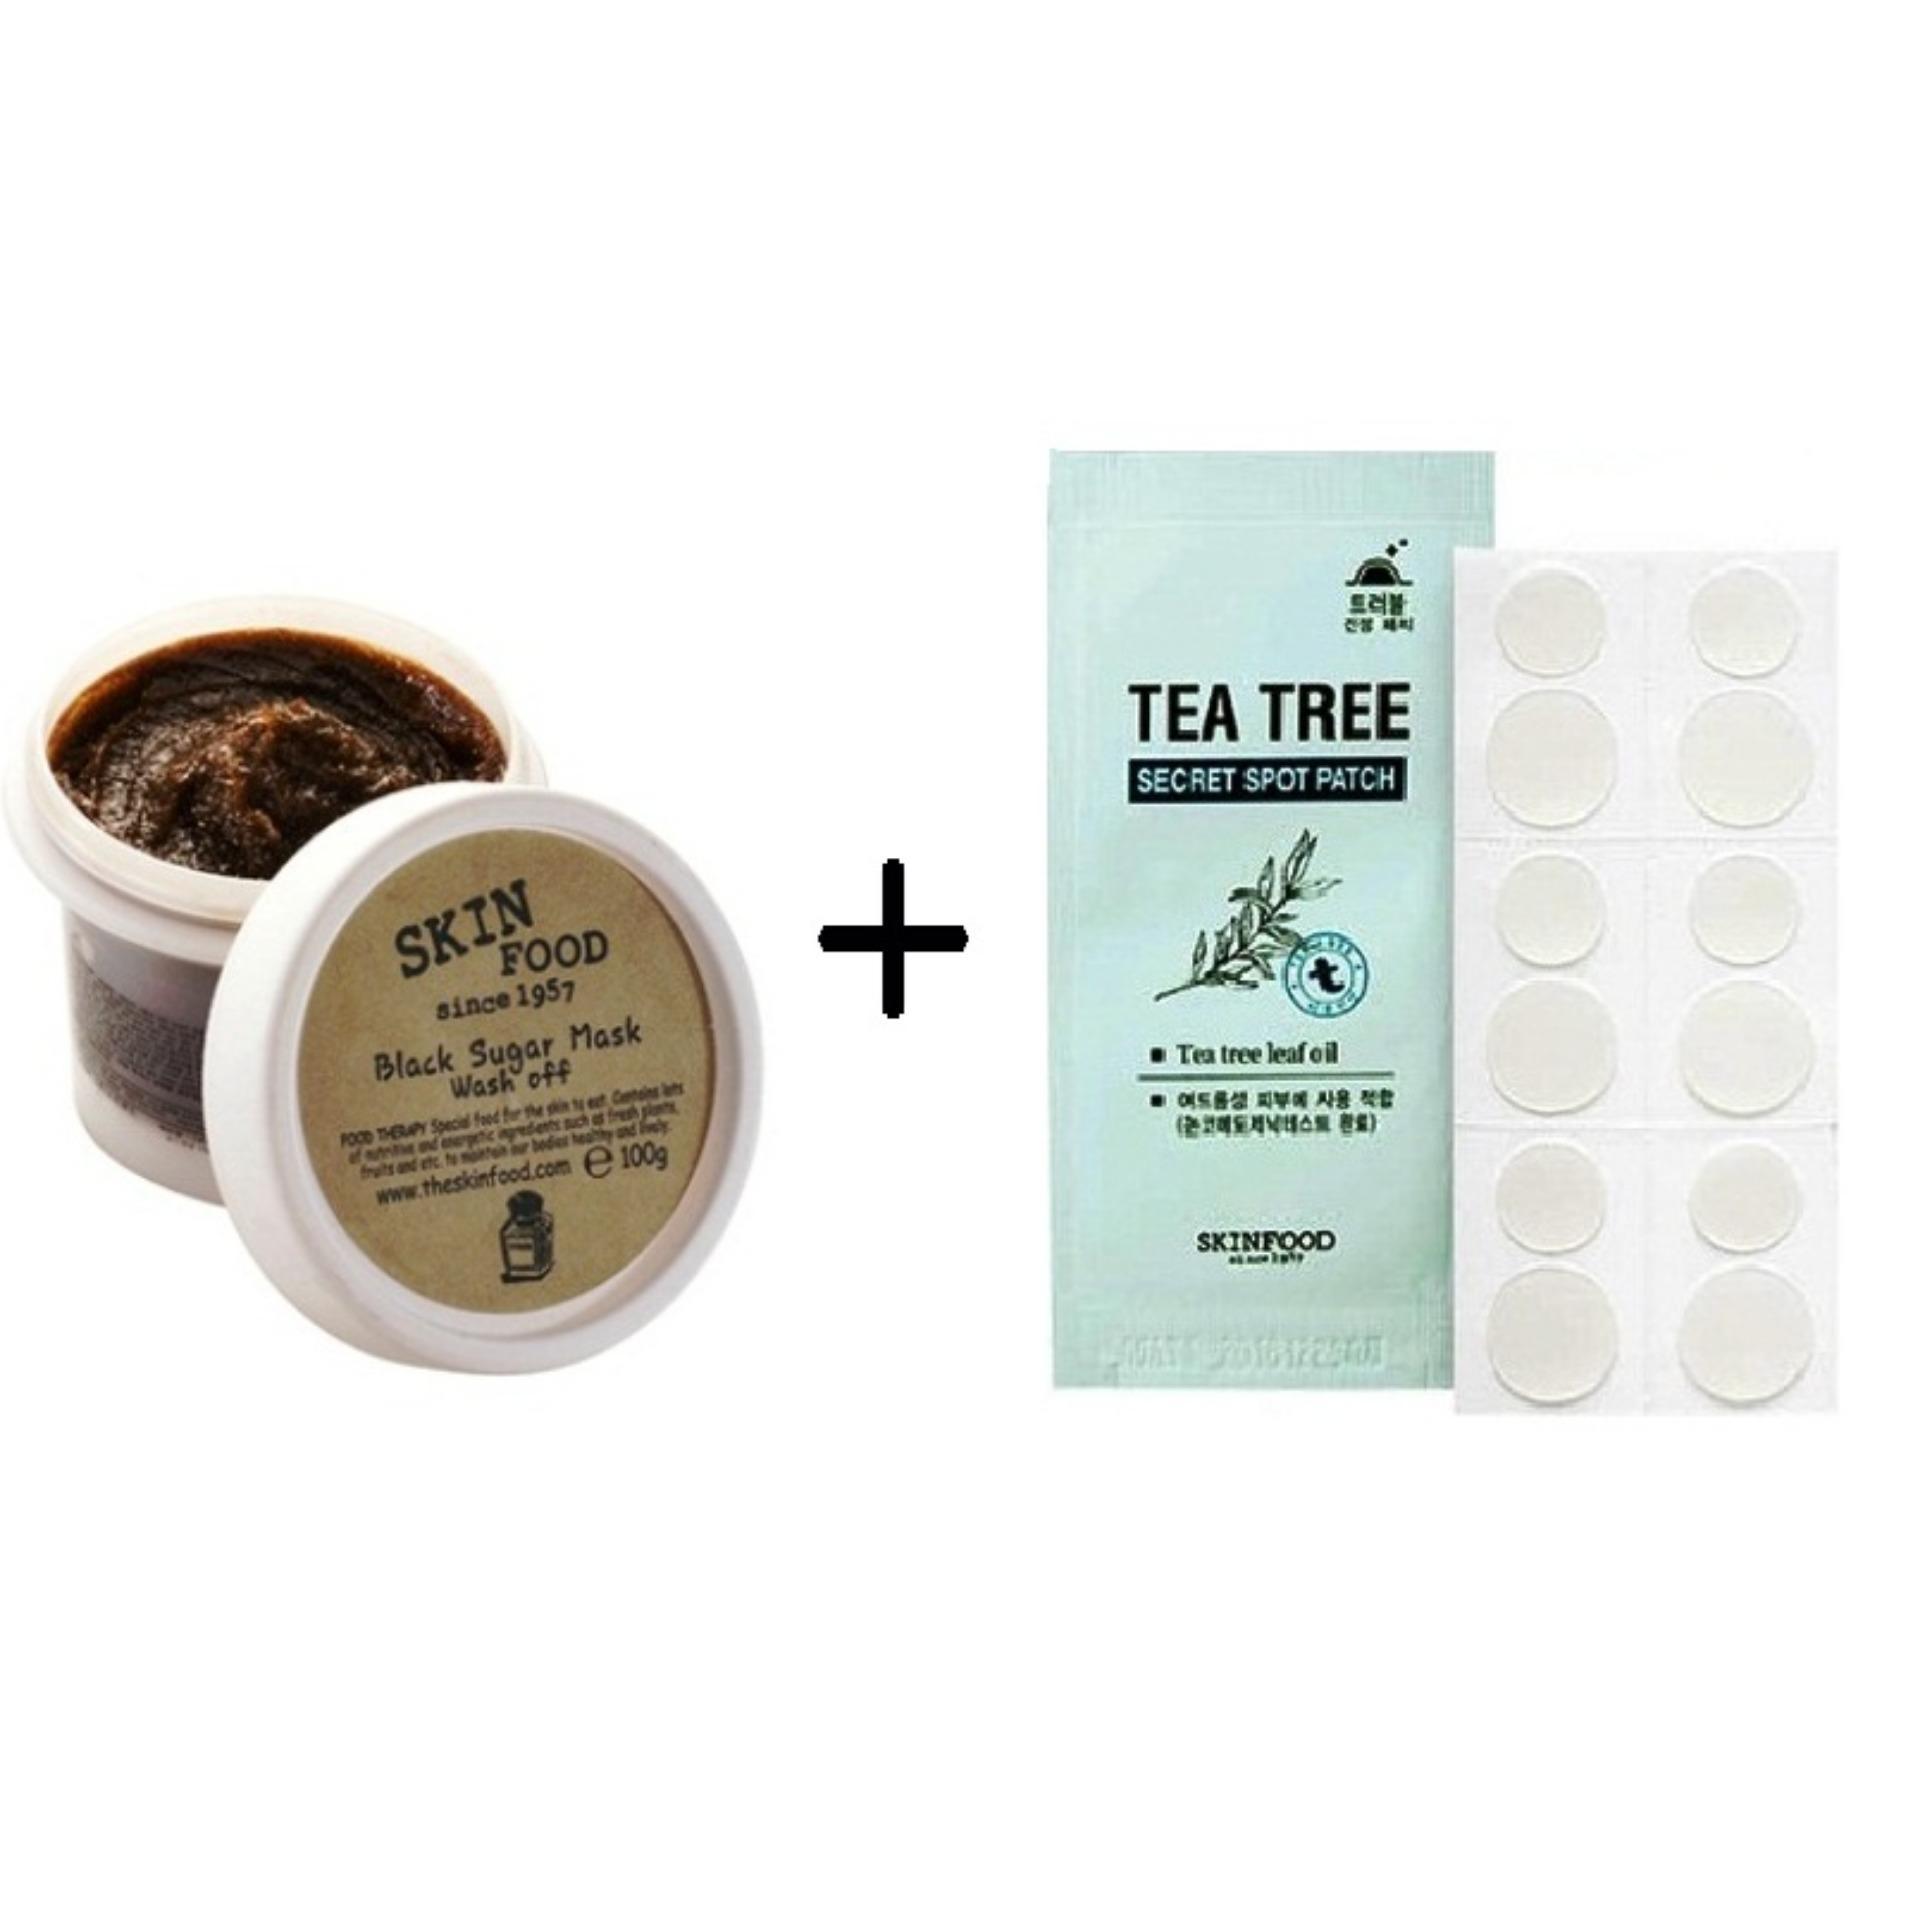 Philippines Korean Cosmetics Skinfood Black Sugar Mask Wash Off Skin Food Honey 100gr Tea Tree Spotpatch